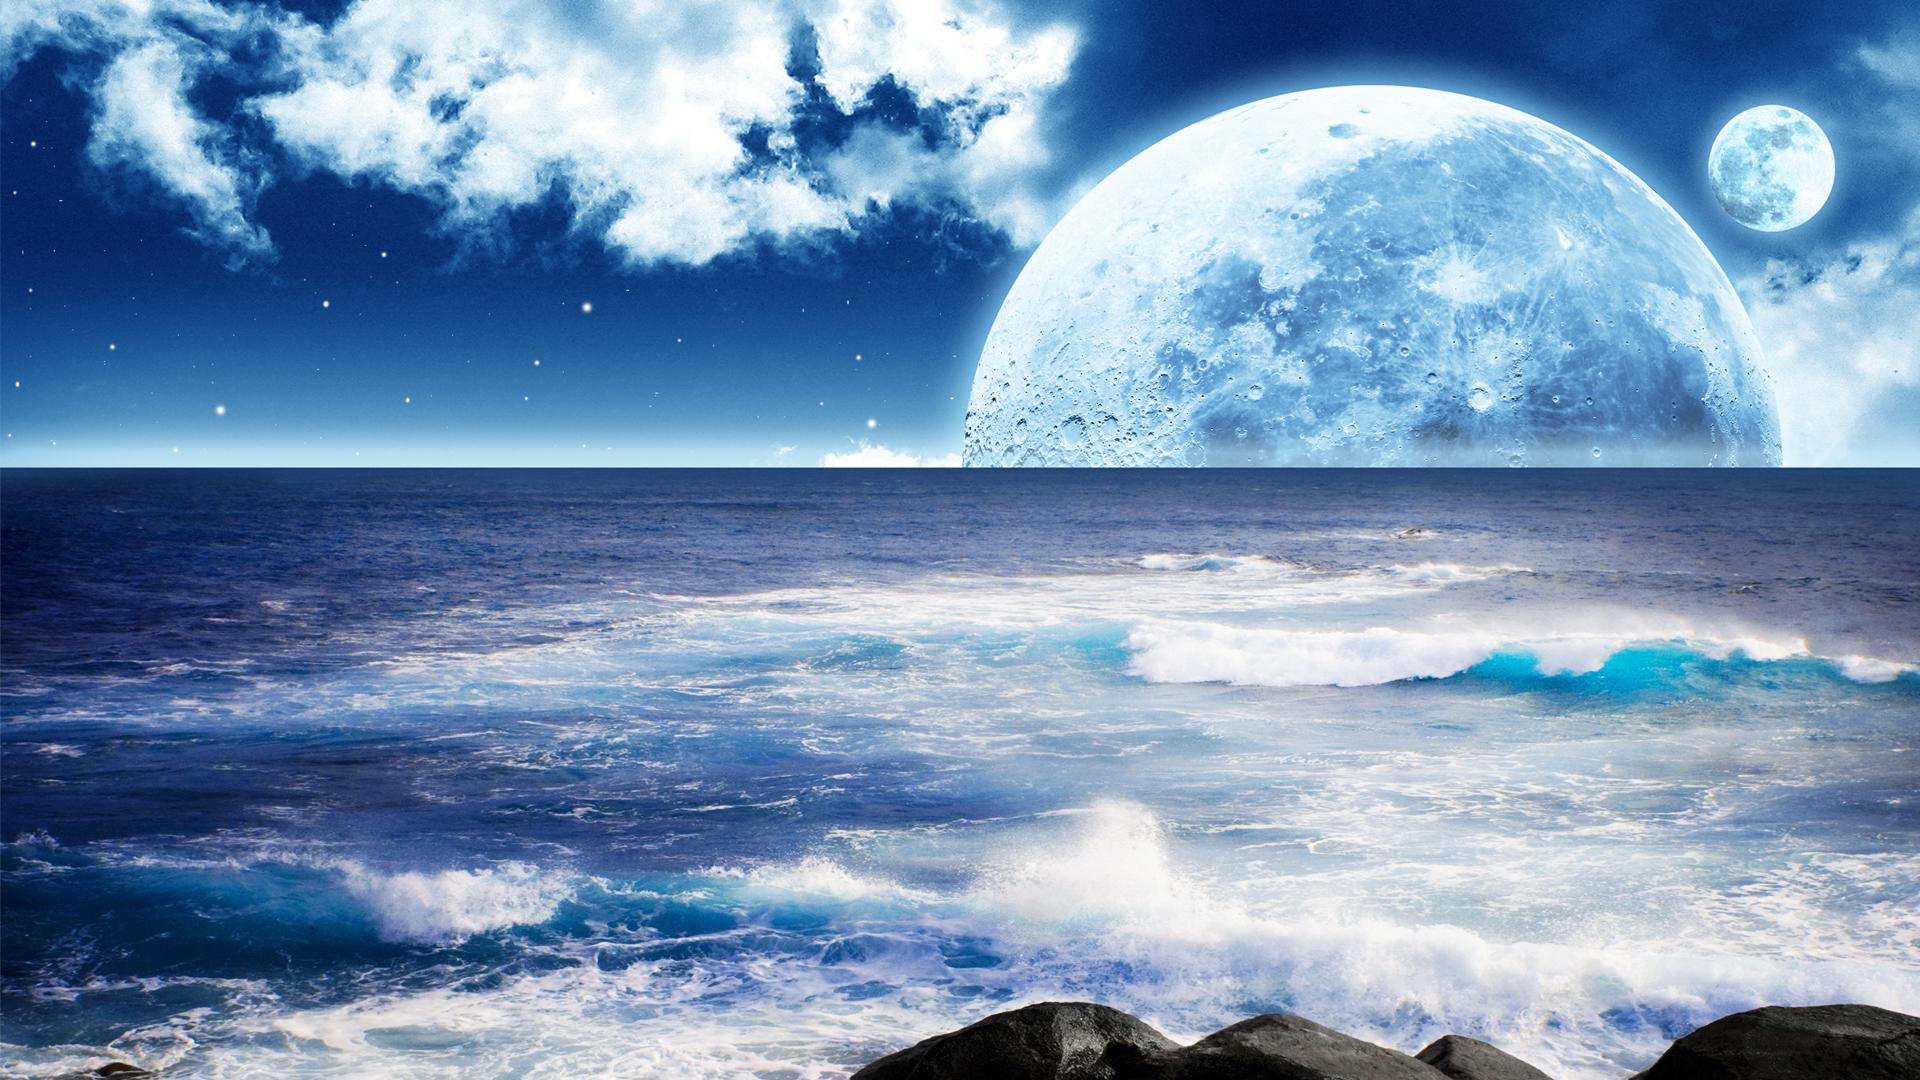 Wallpaper: blue world Full HD by kartine29